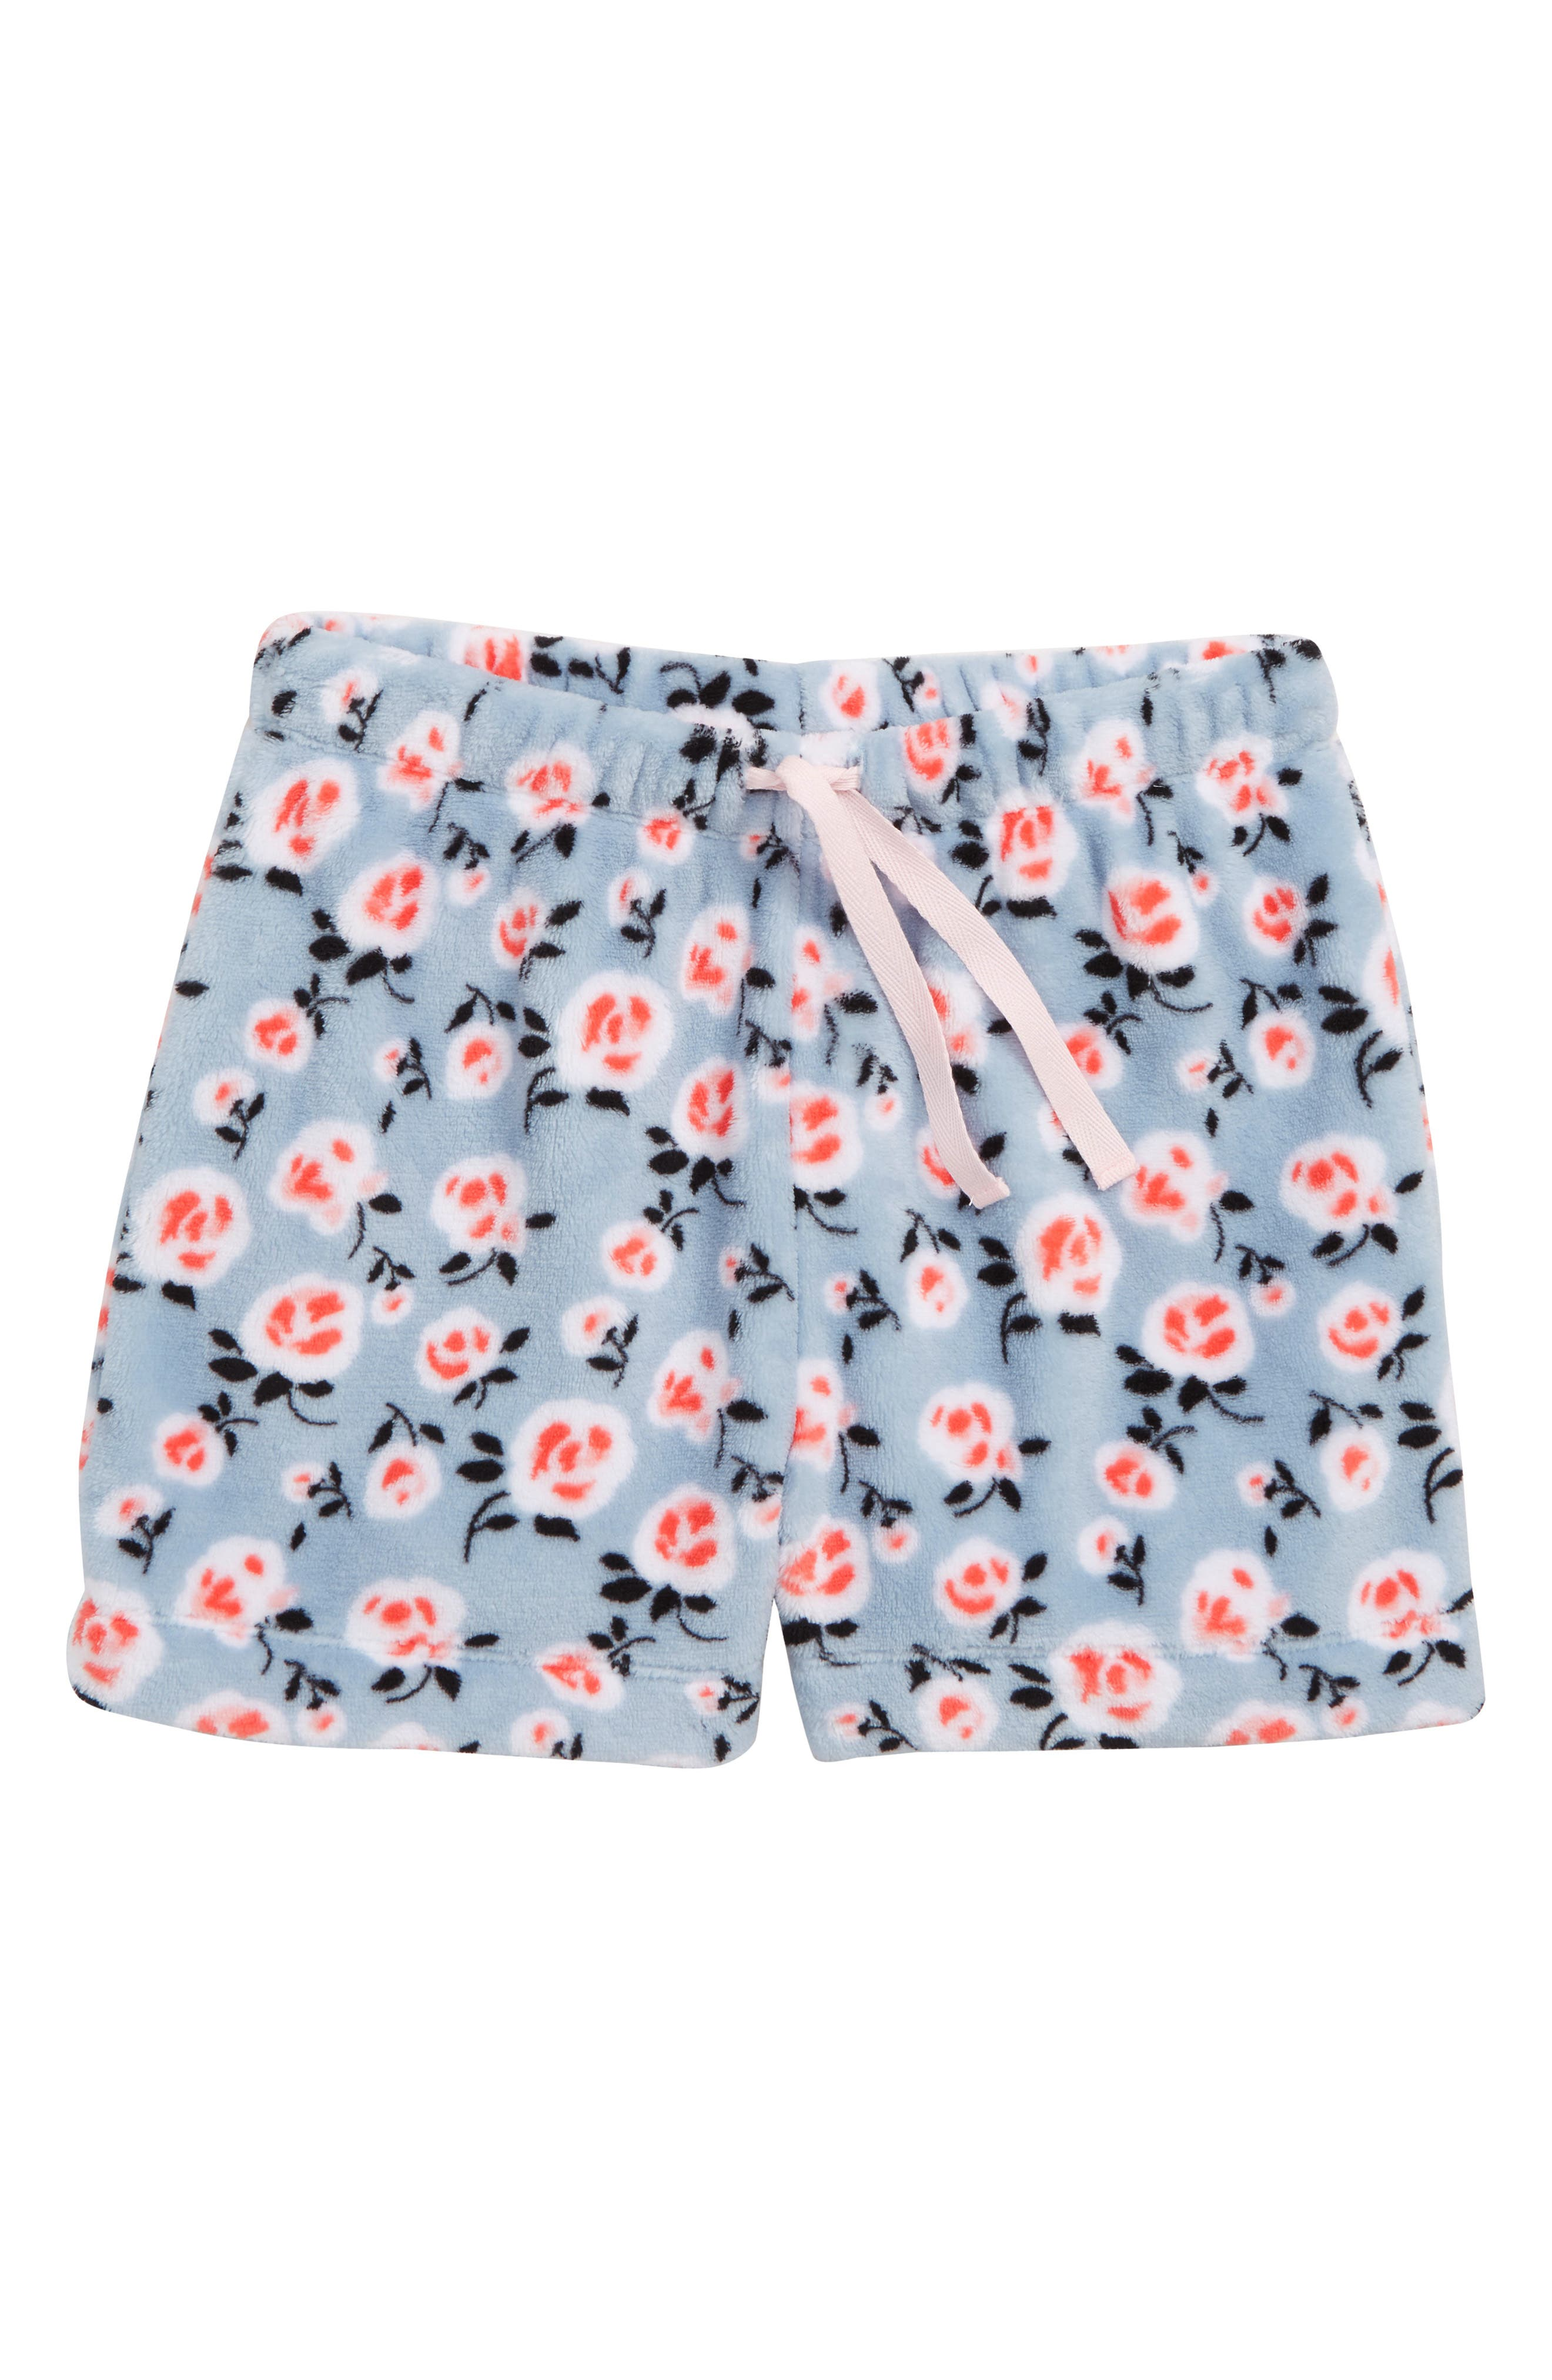 Fleece Sleep Shorts,                         Main,                         color, BLUE CELESTIAL LOVELY FLOWER